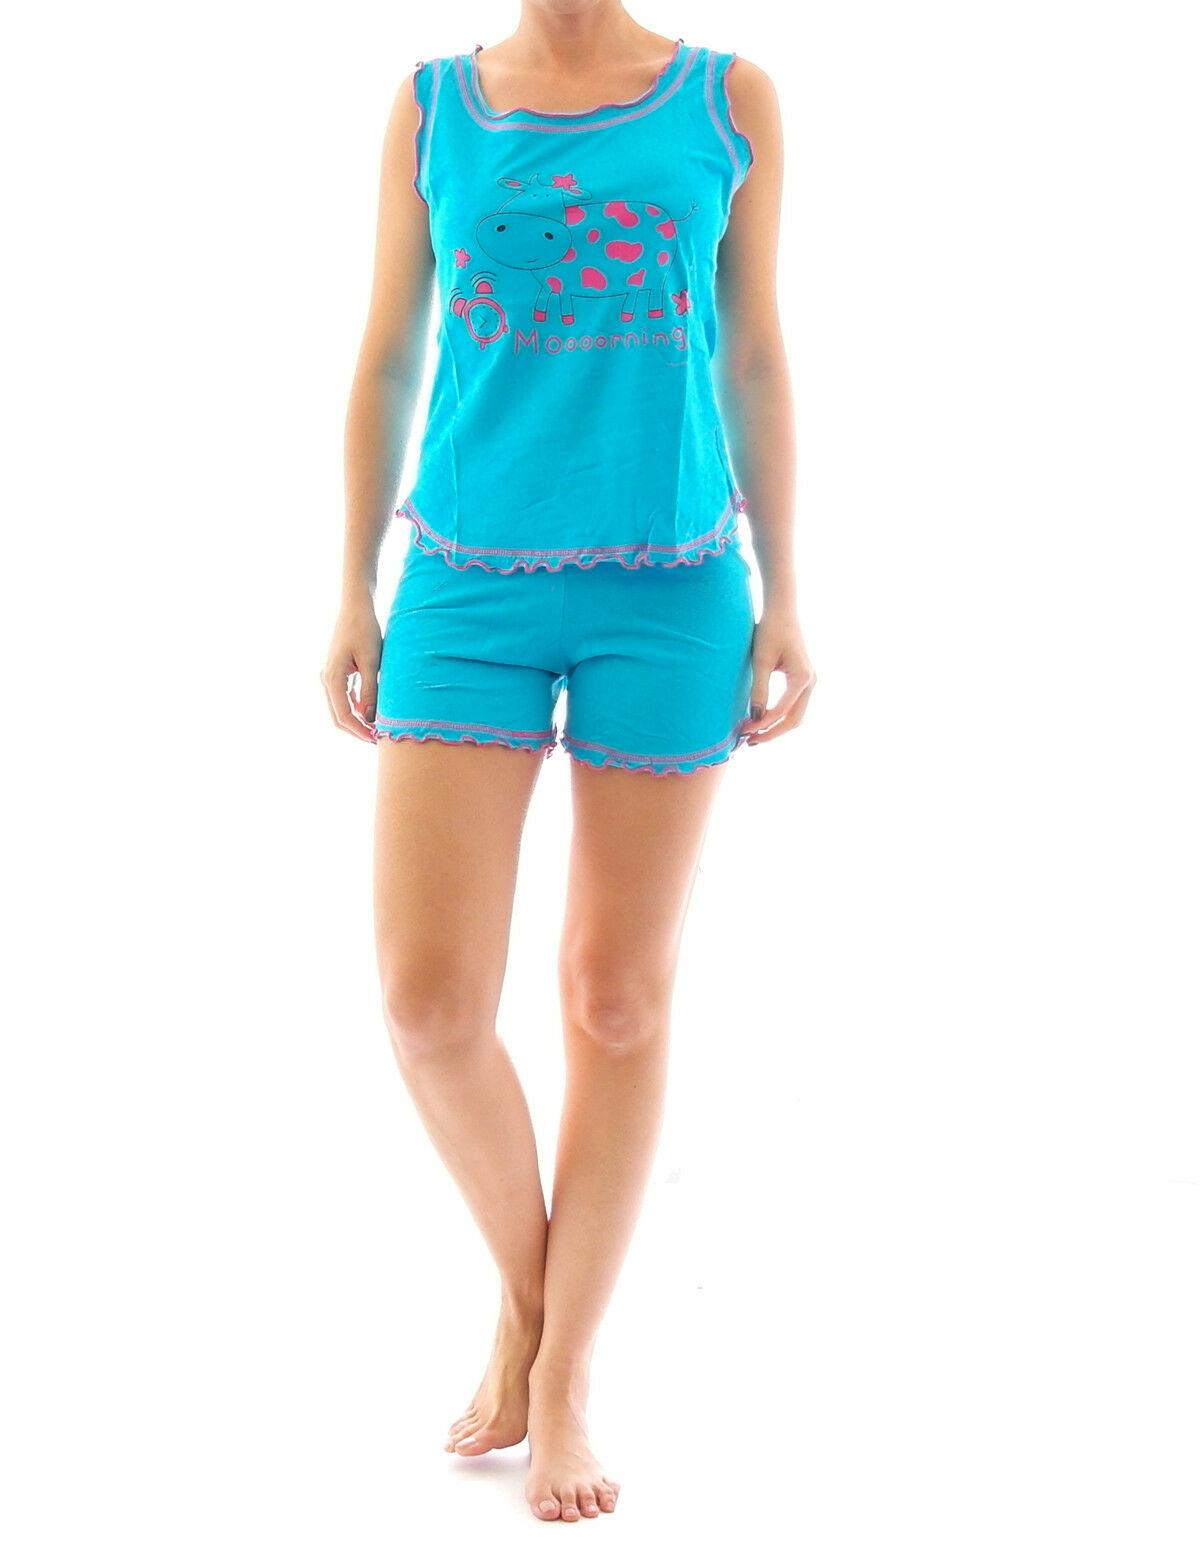 brand new 62d4b f2969 Damen Pyjama Schlafanzug Top Shirt Kurzarm kurze Shorts Motiv 5184